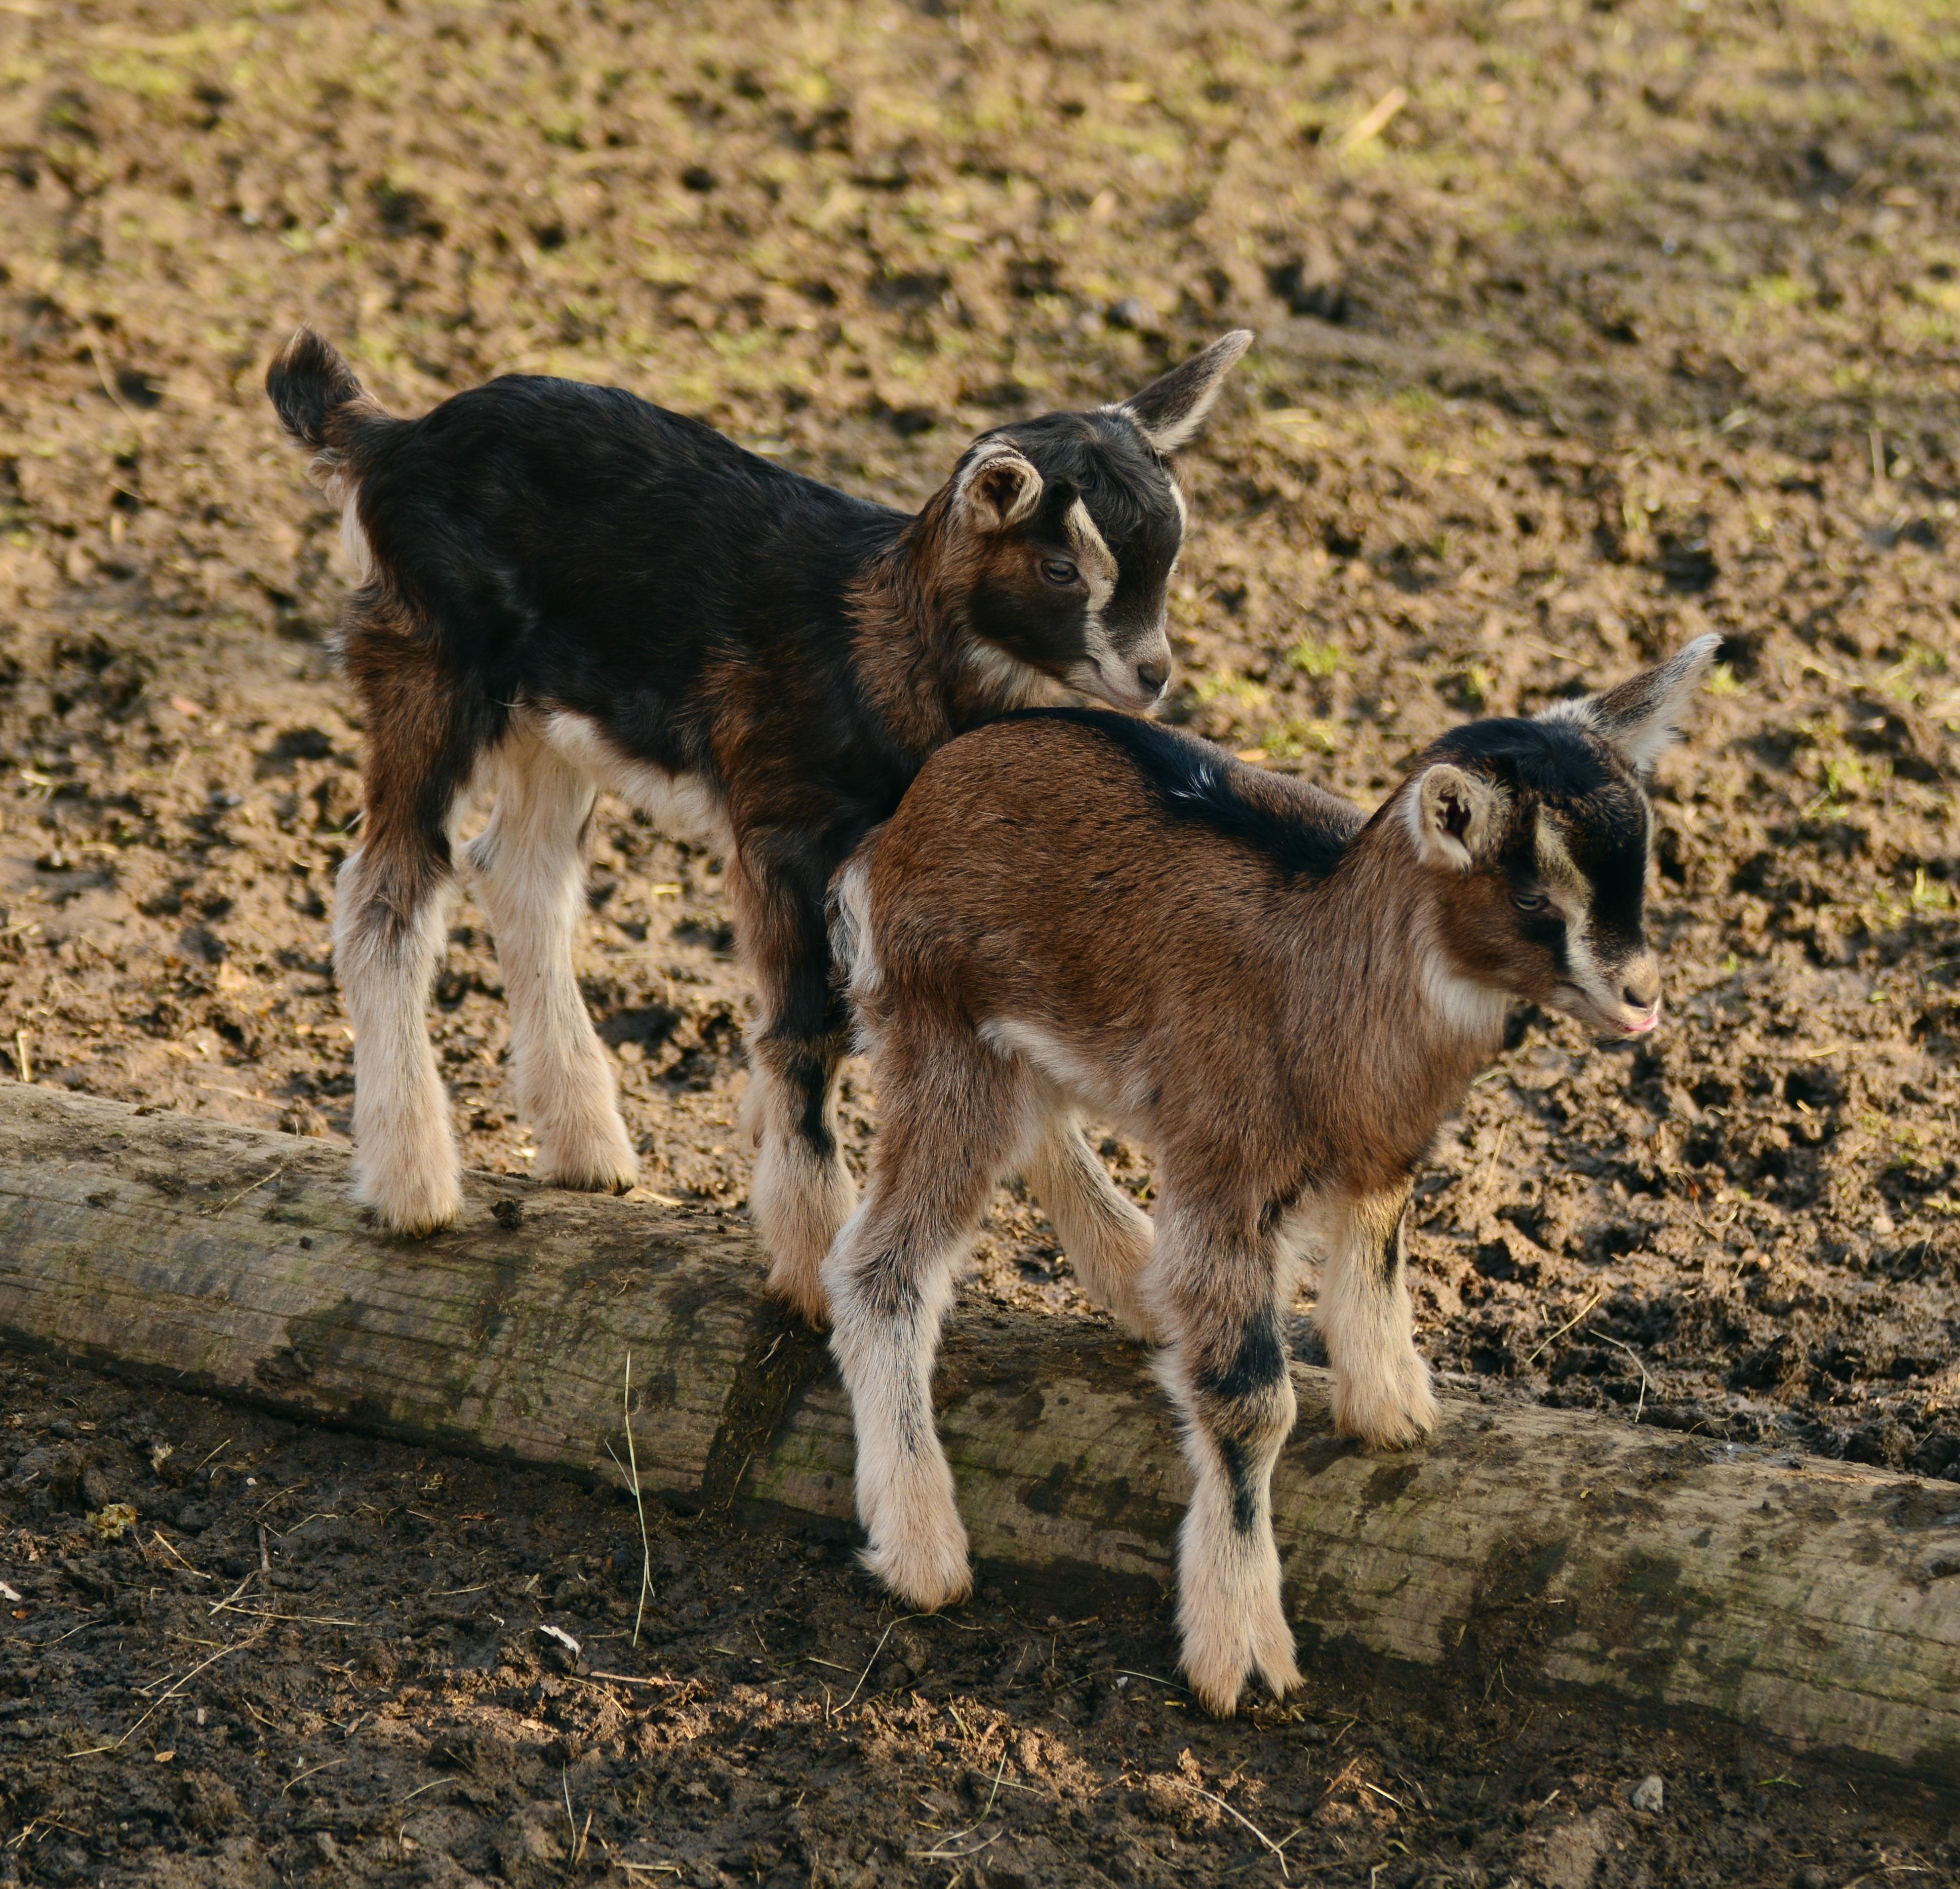 goats-2052736